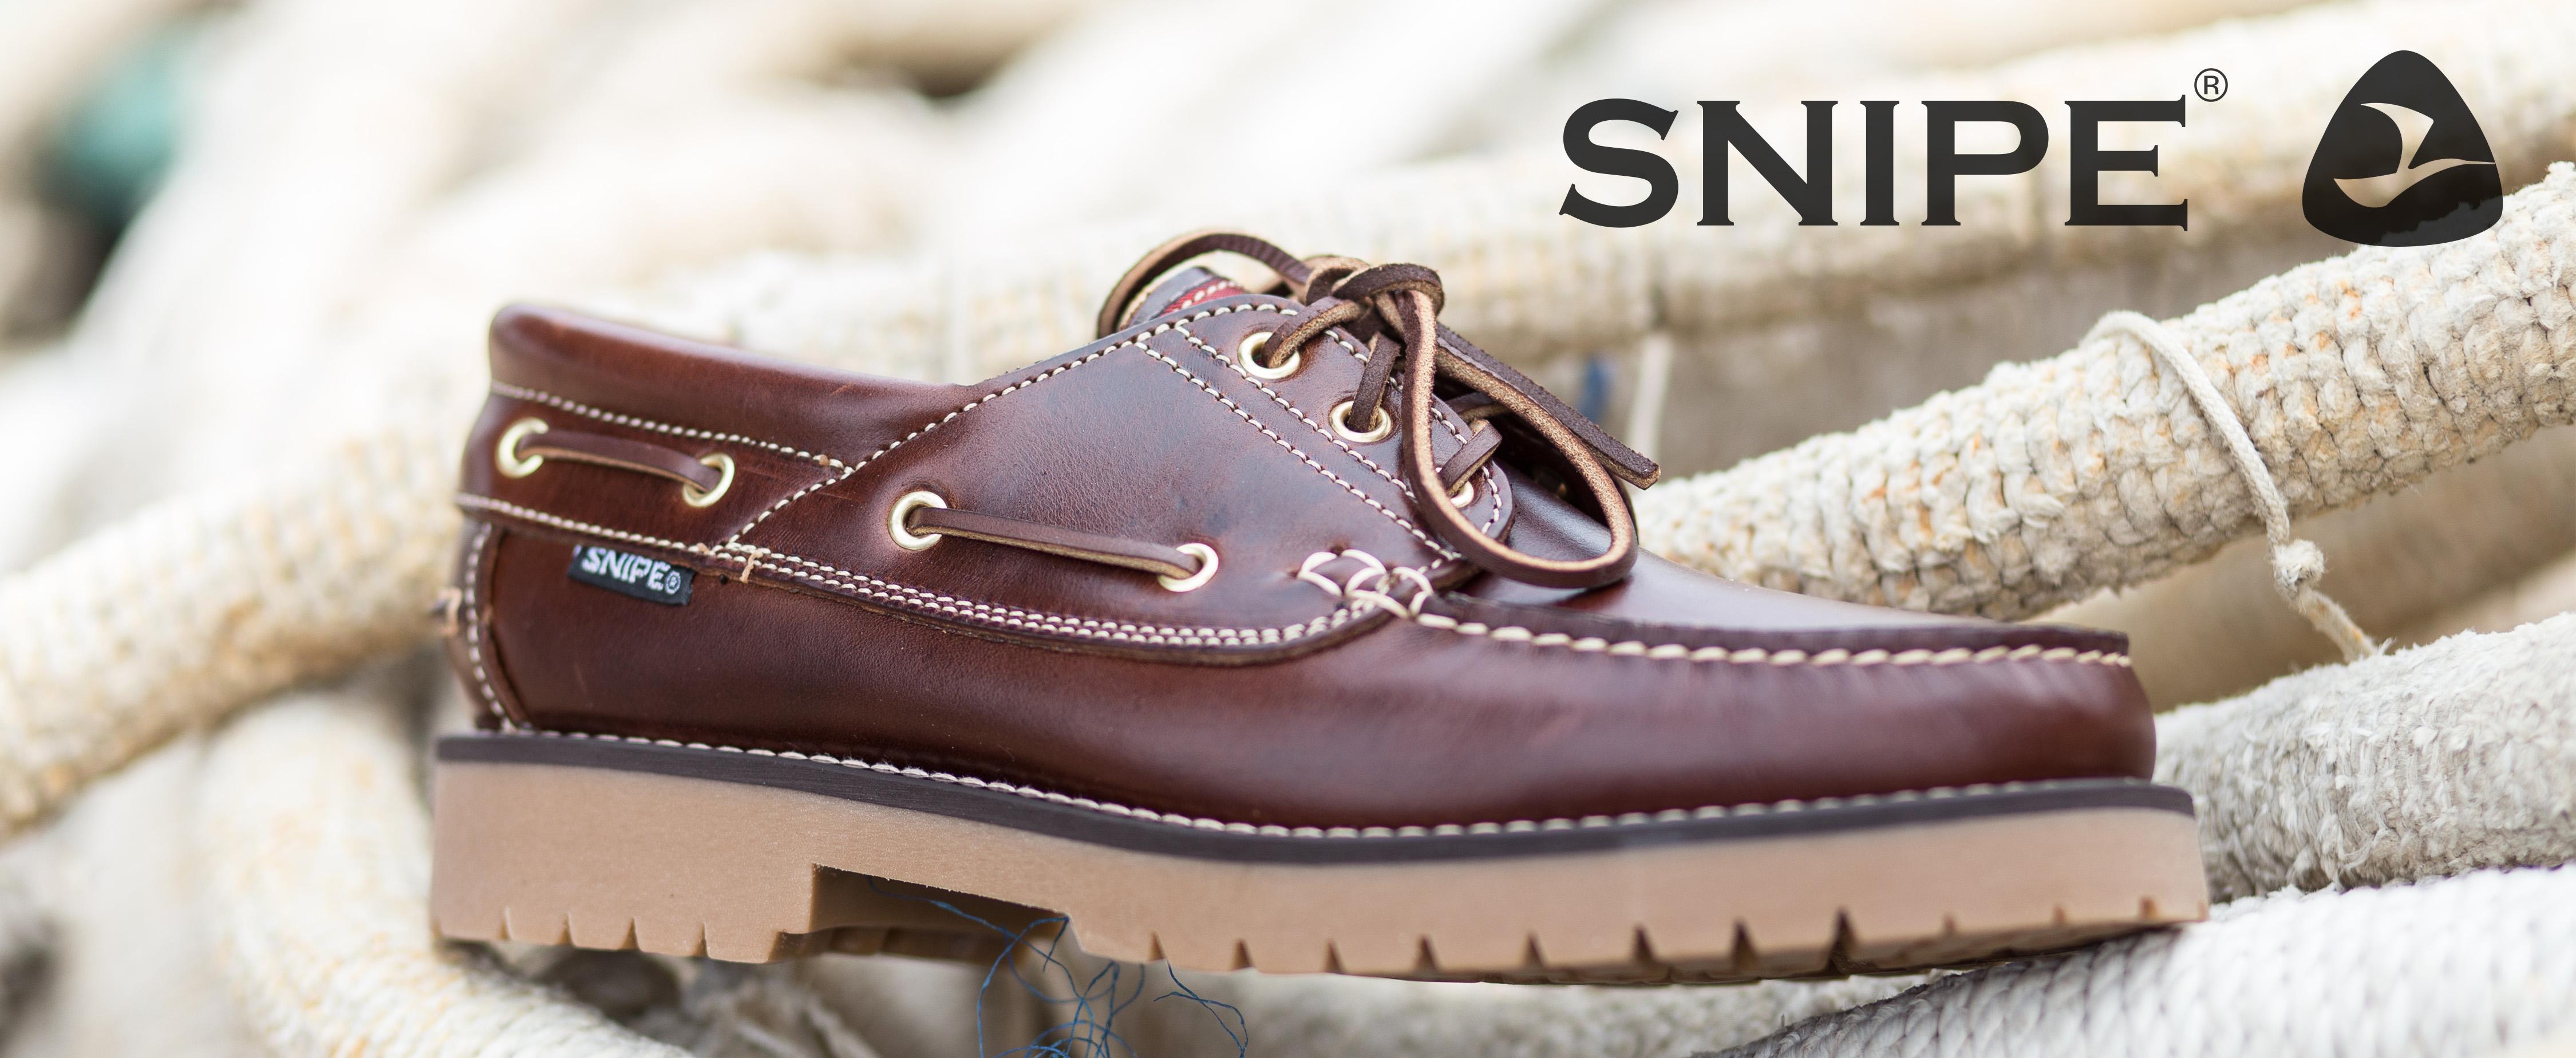 Zapatos Snipe náutico 21201 ciclón marrón seahorse